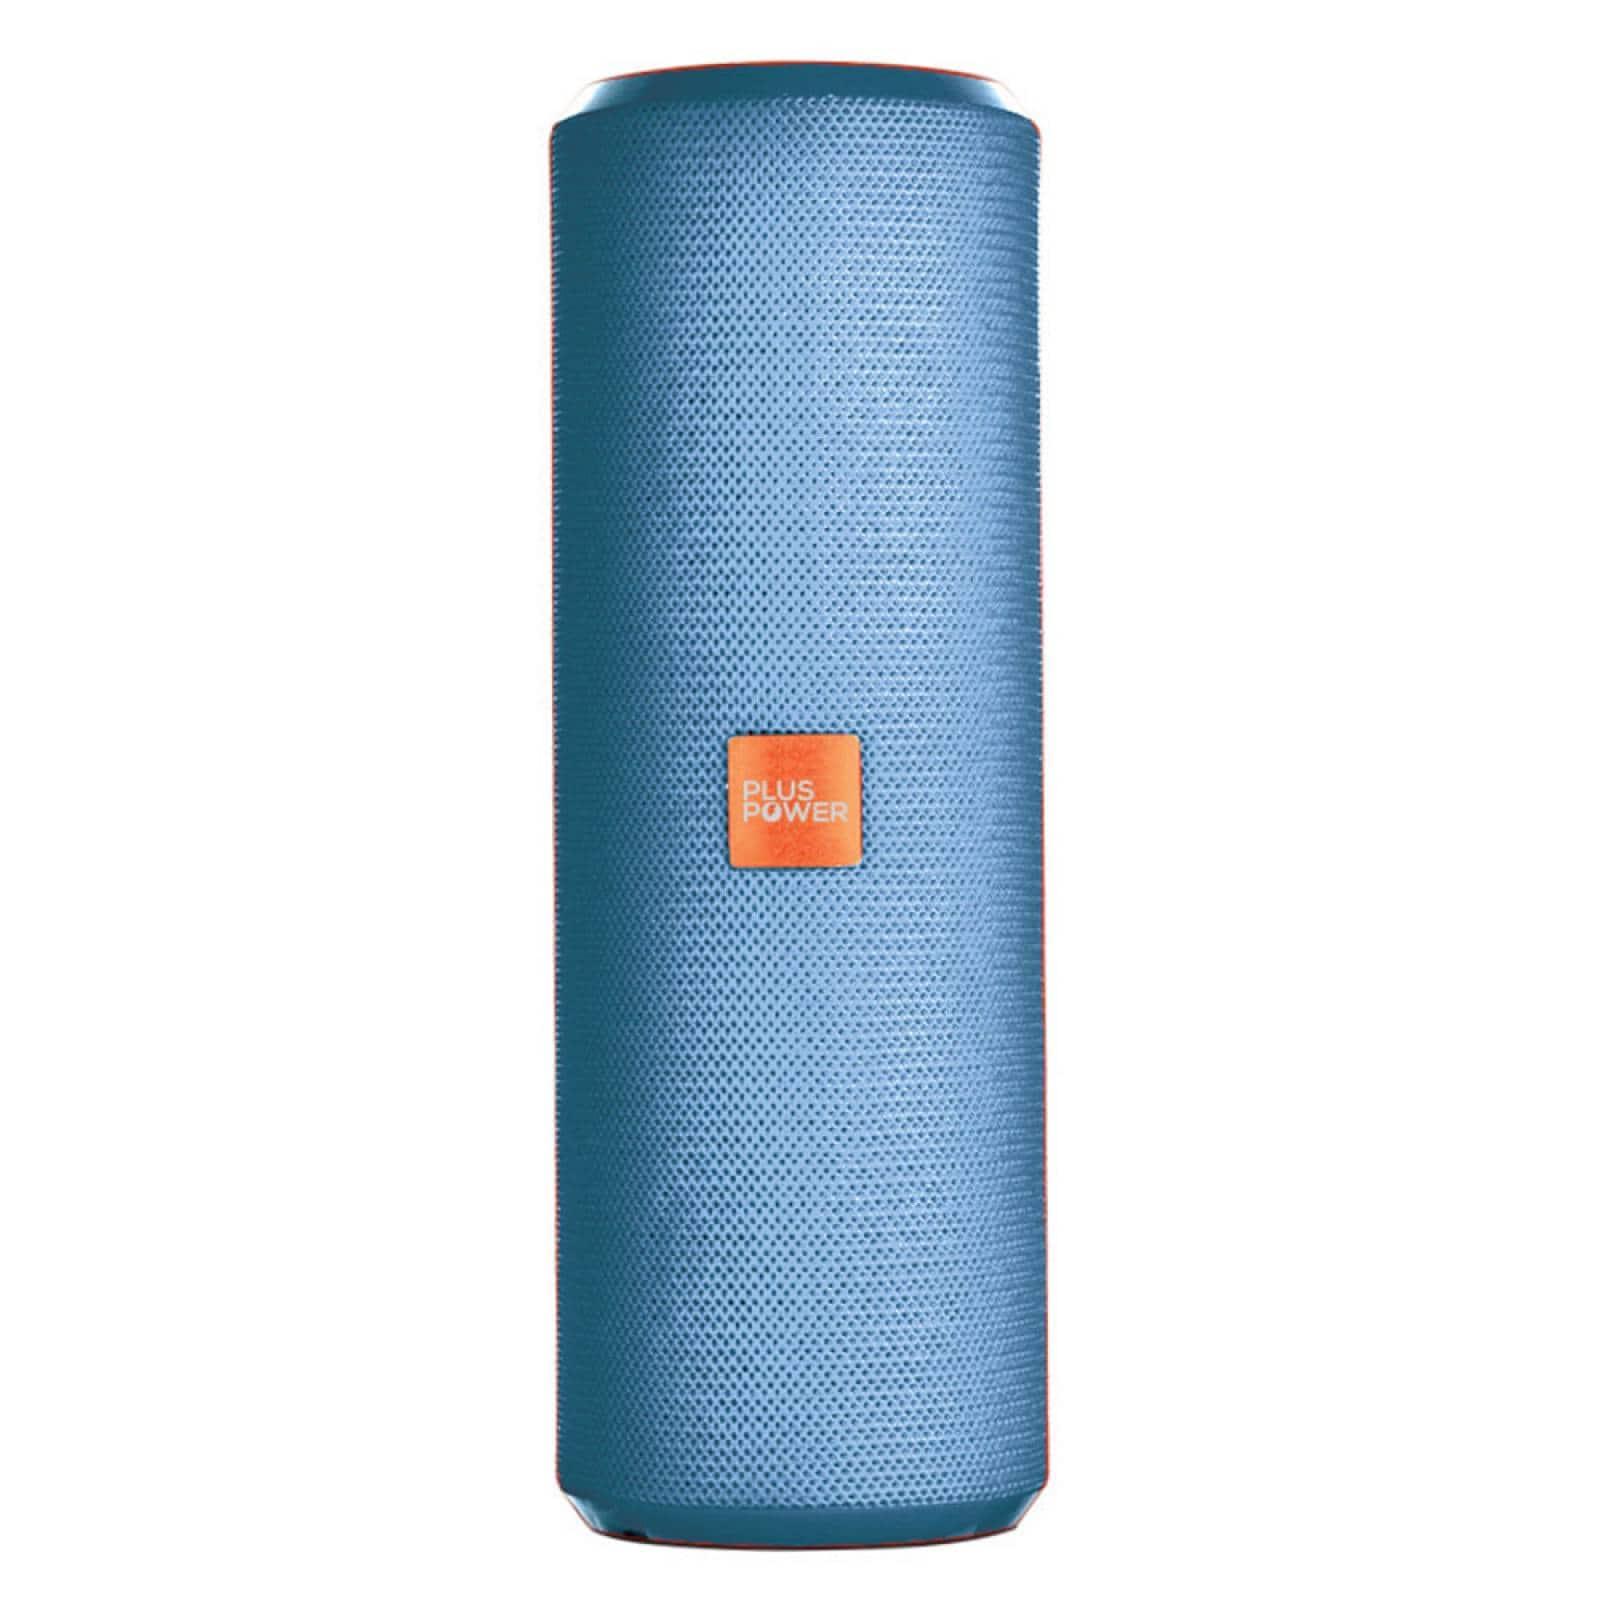 Bocina Bluetooth Plus Power Sd Aux Mp3 200w Pp-sbt106  azul